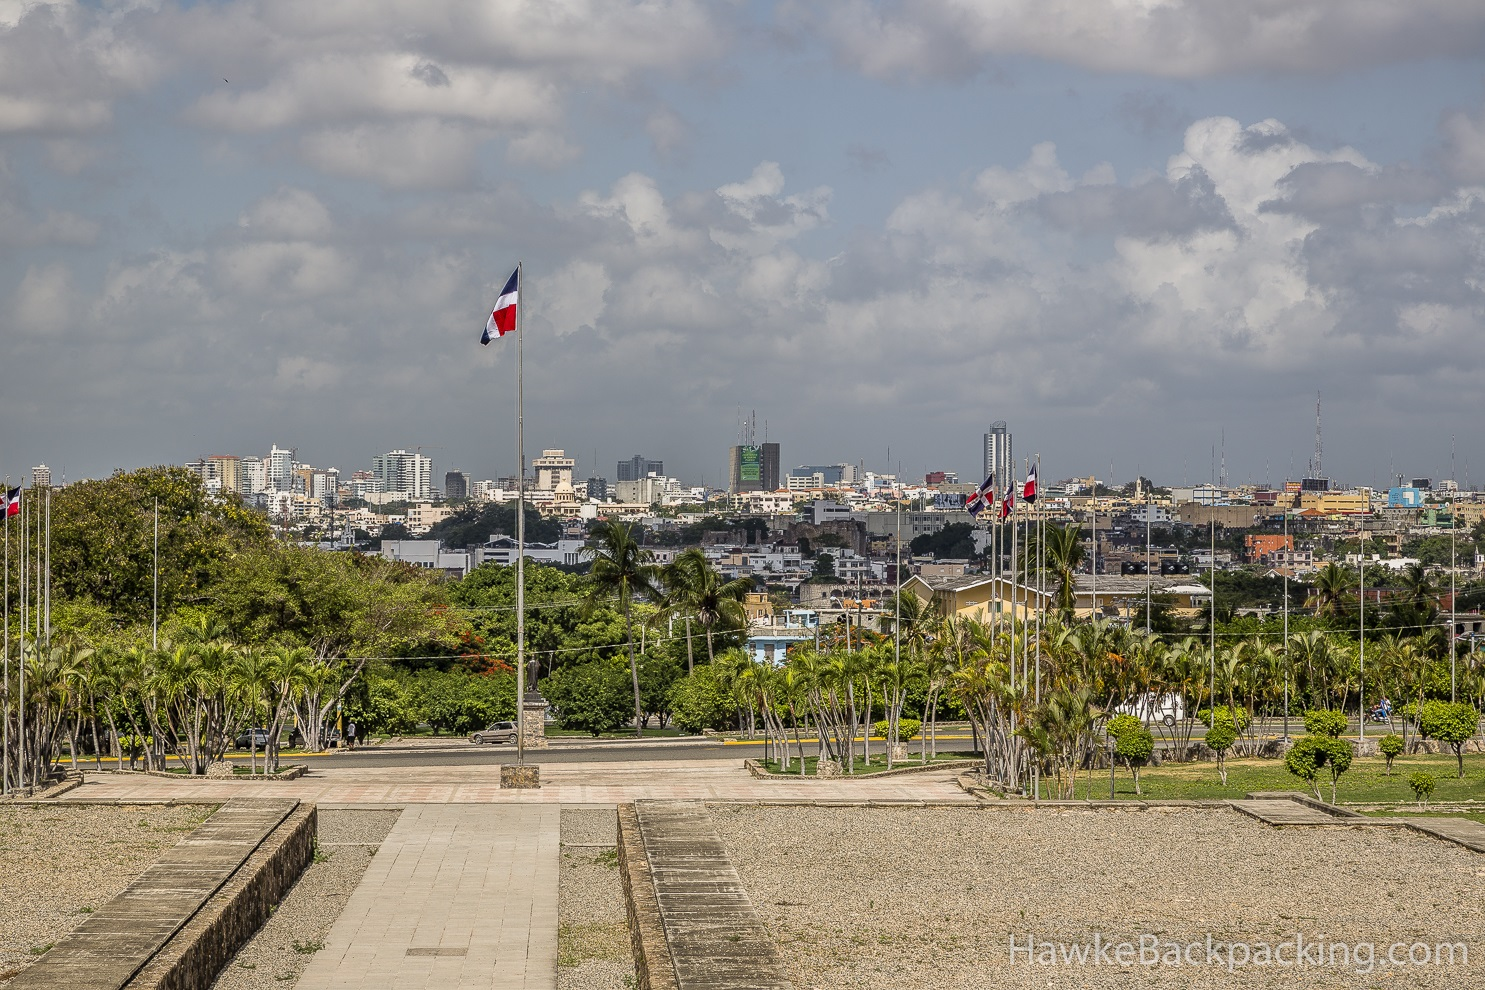 Santo Domingo Hawkebackpacking Com